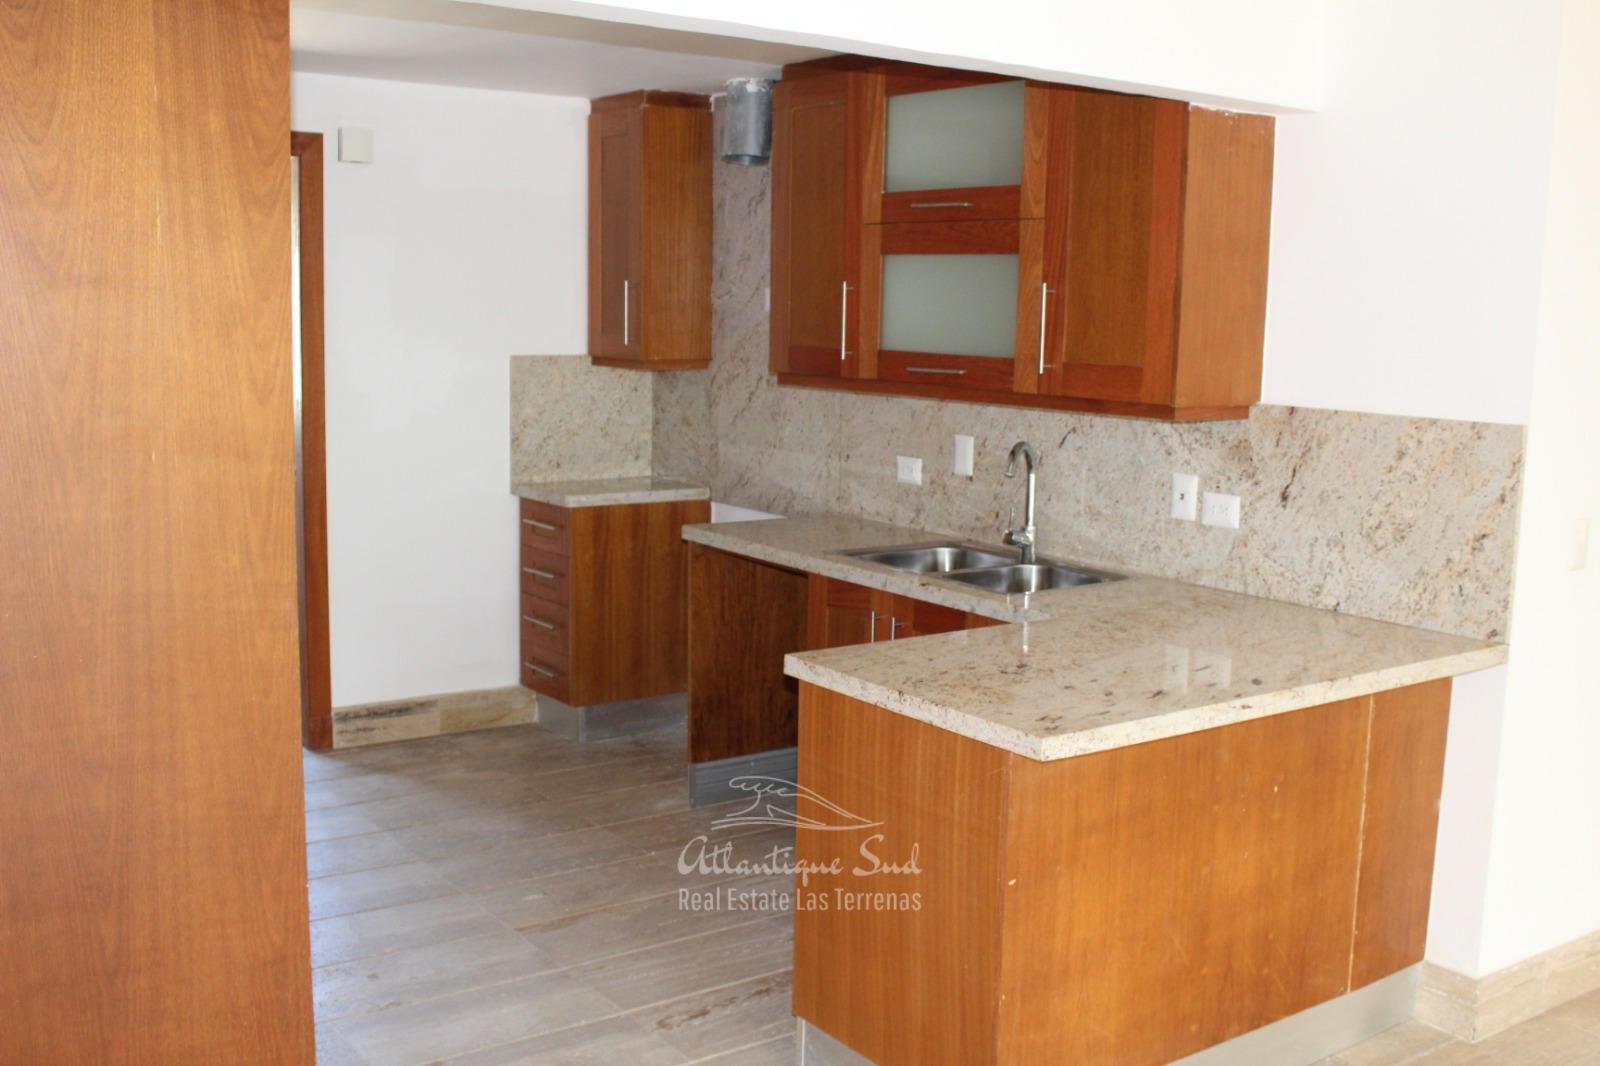 Apartments near the beach real estate las terrenas dominican republic 31 (18).jpg